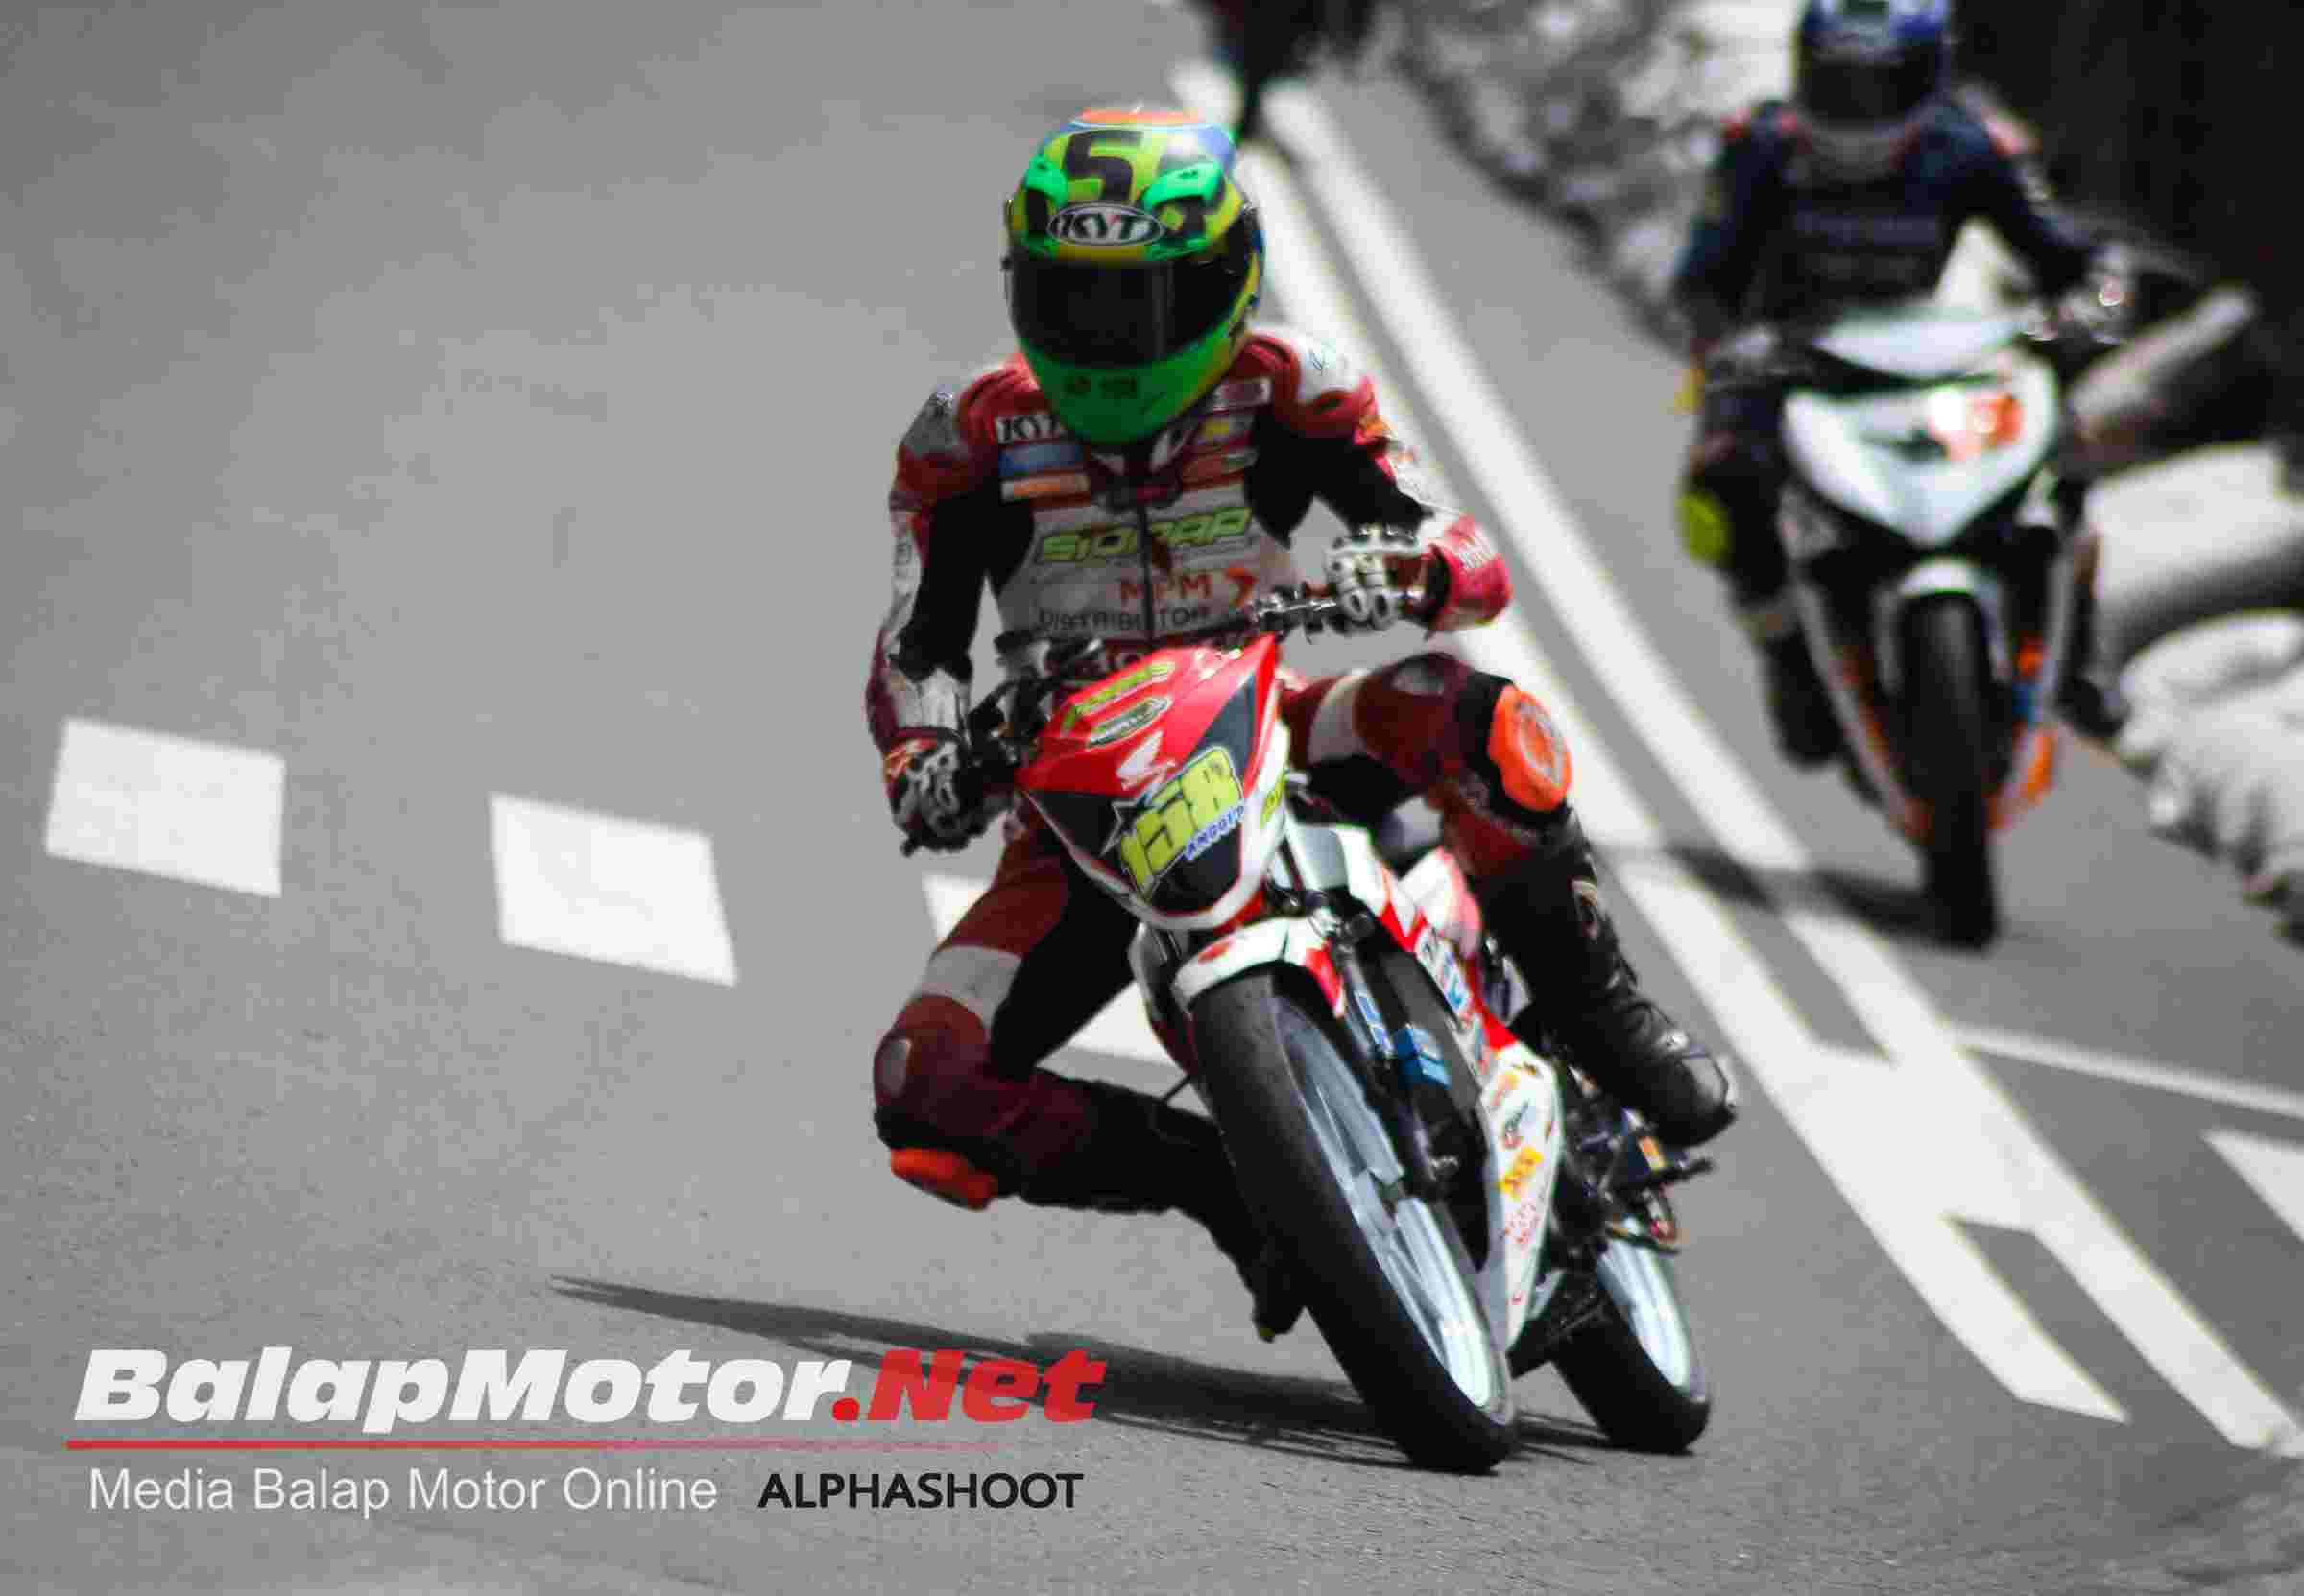 Anggi Permana pembalap Tasik, juara 2 MP1 Motoprix wonogiri 2016